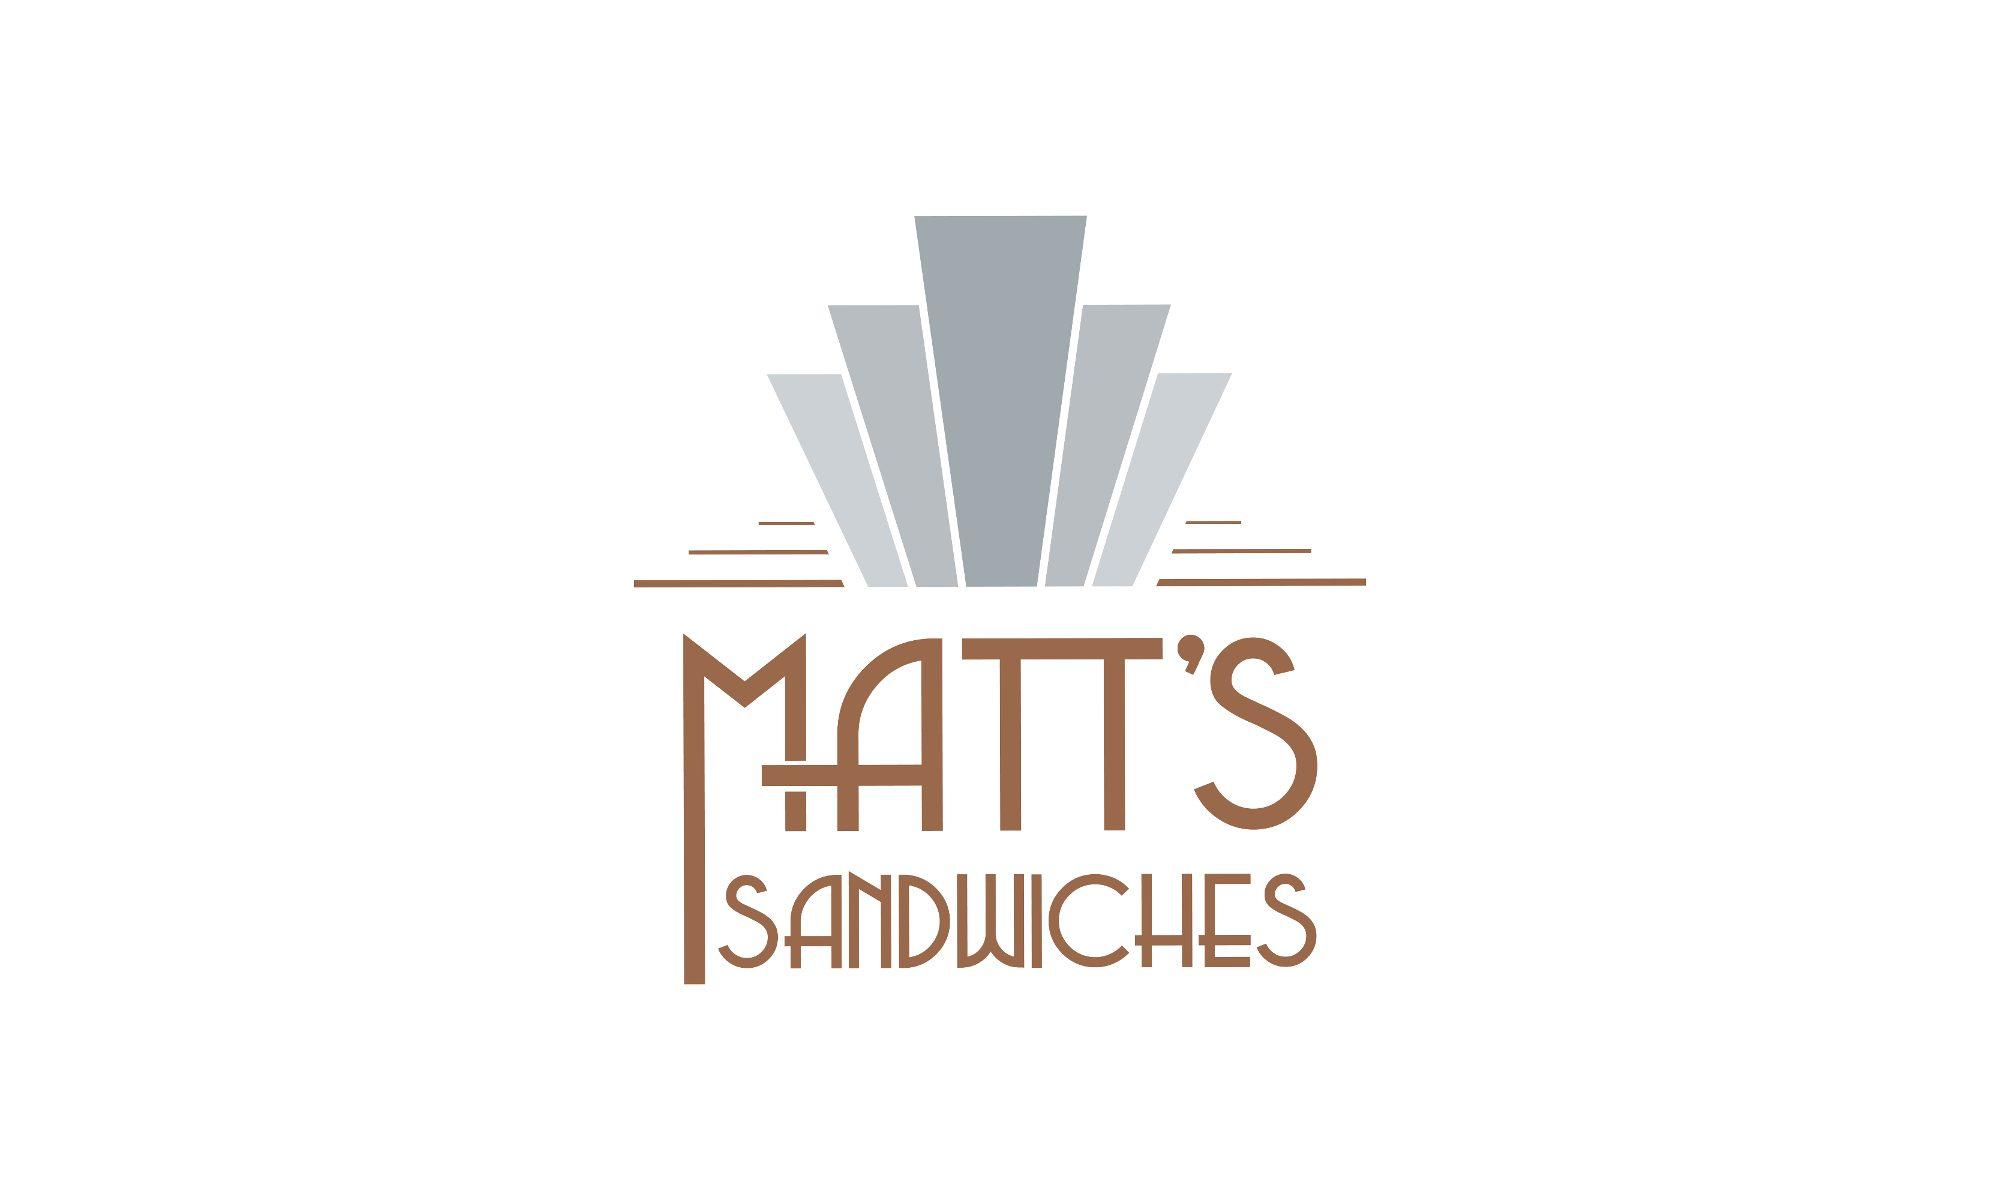 Matt's Sandwiches